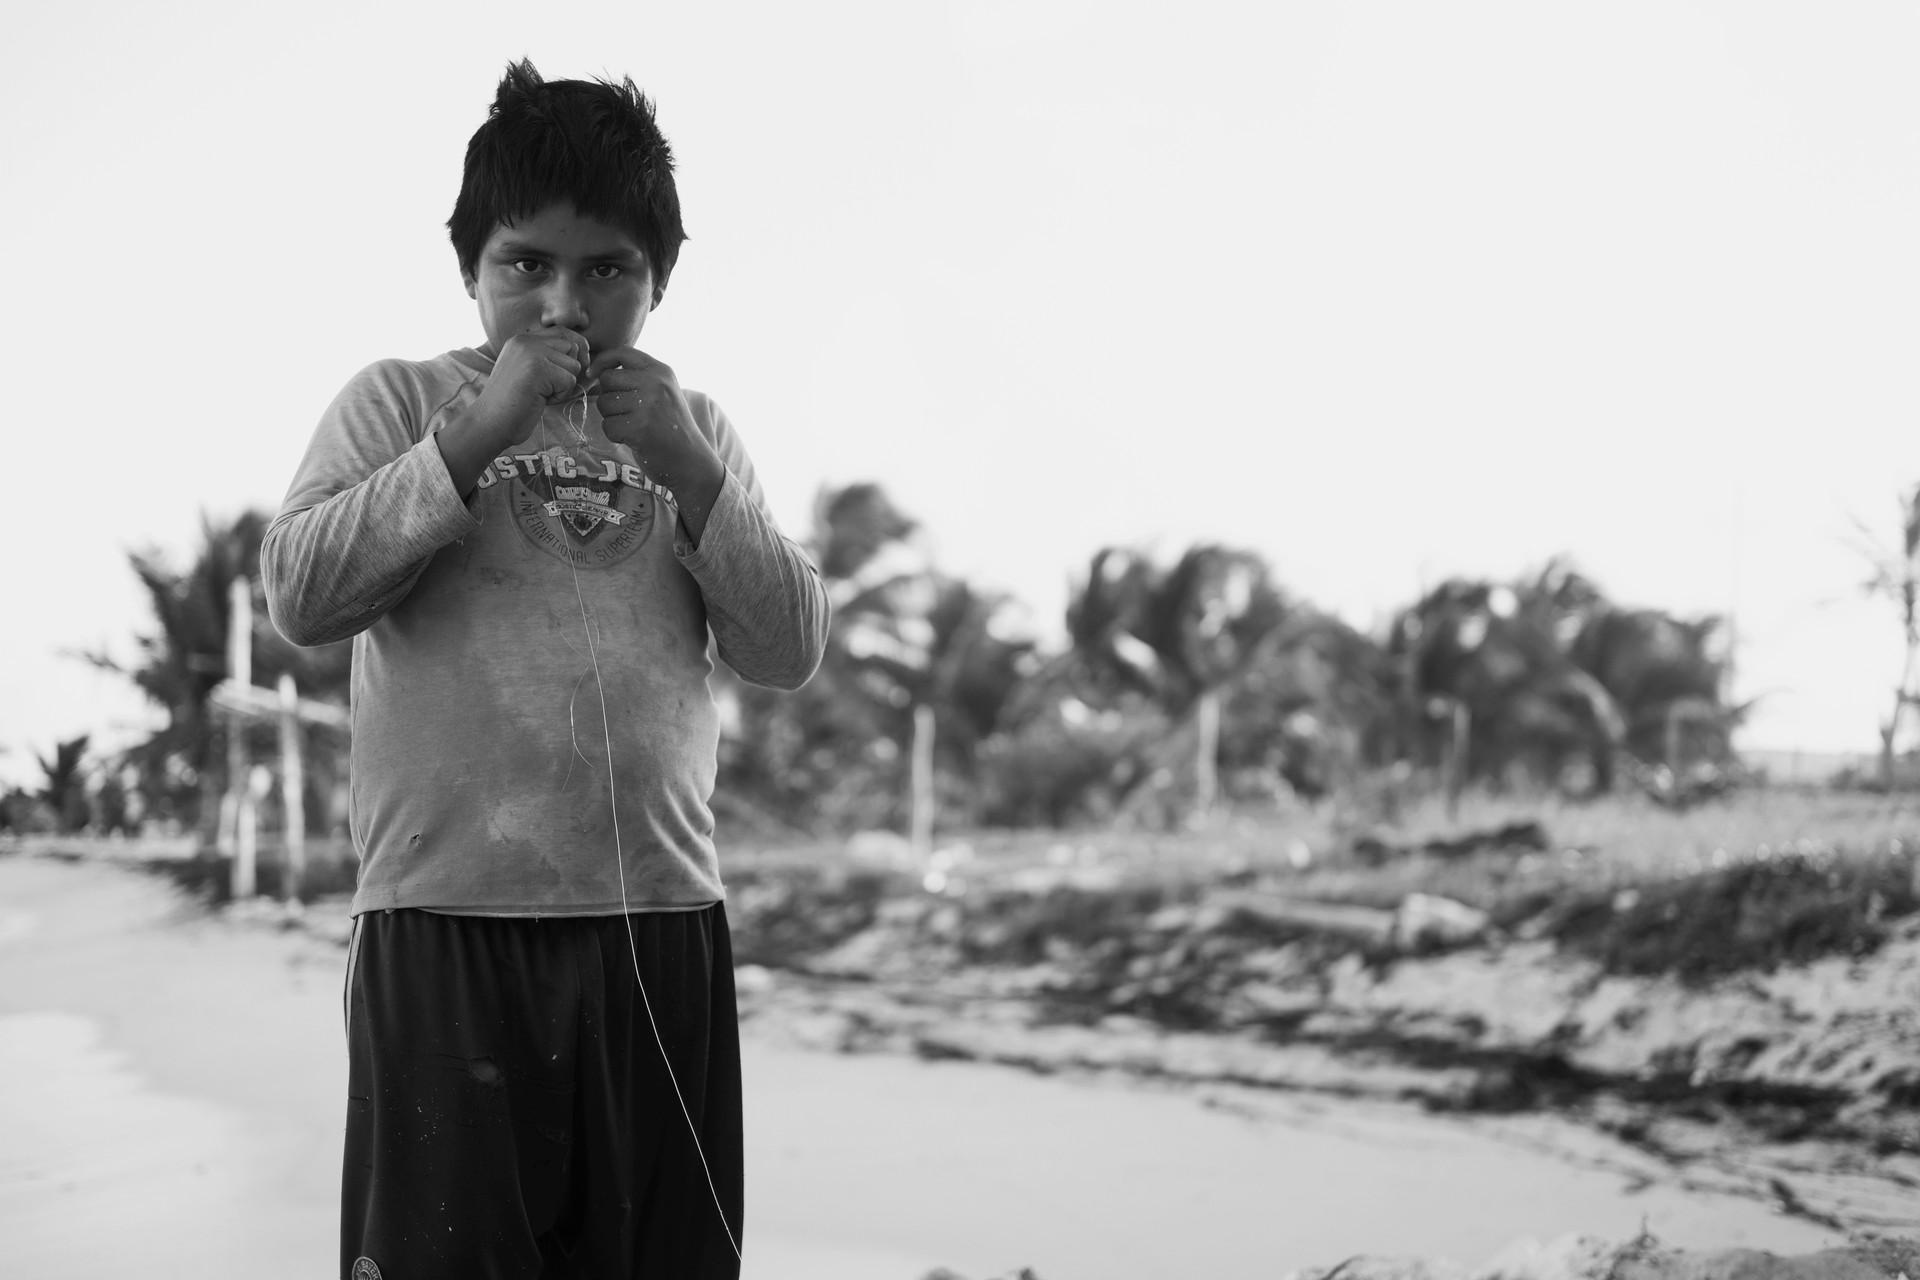 vuong vu photography, seattle, lifestyle photographer, fishing village